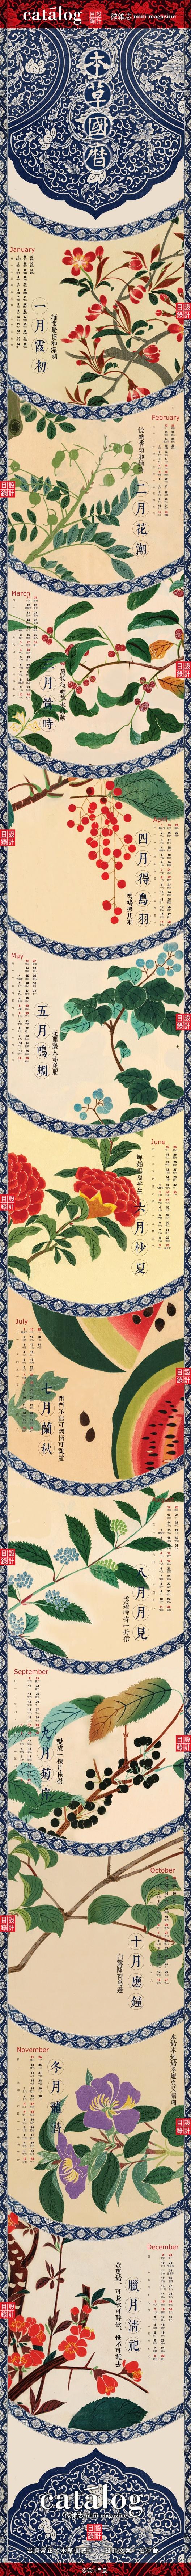 Asian art inspirations : Single-page calendar